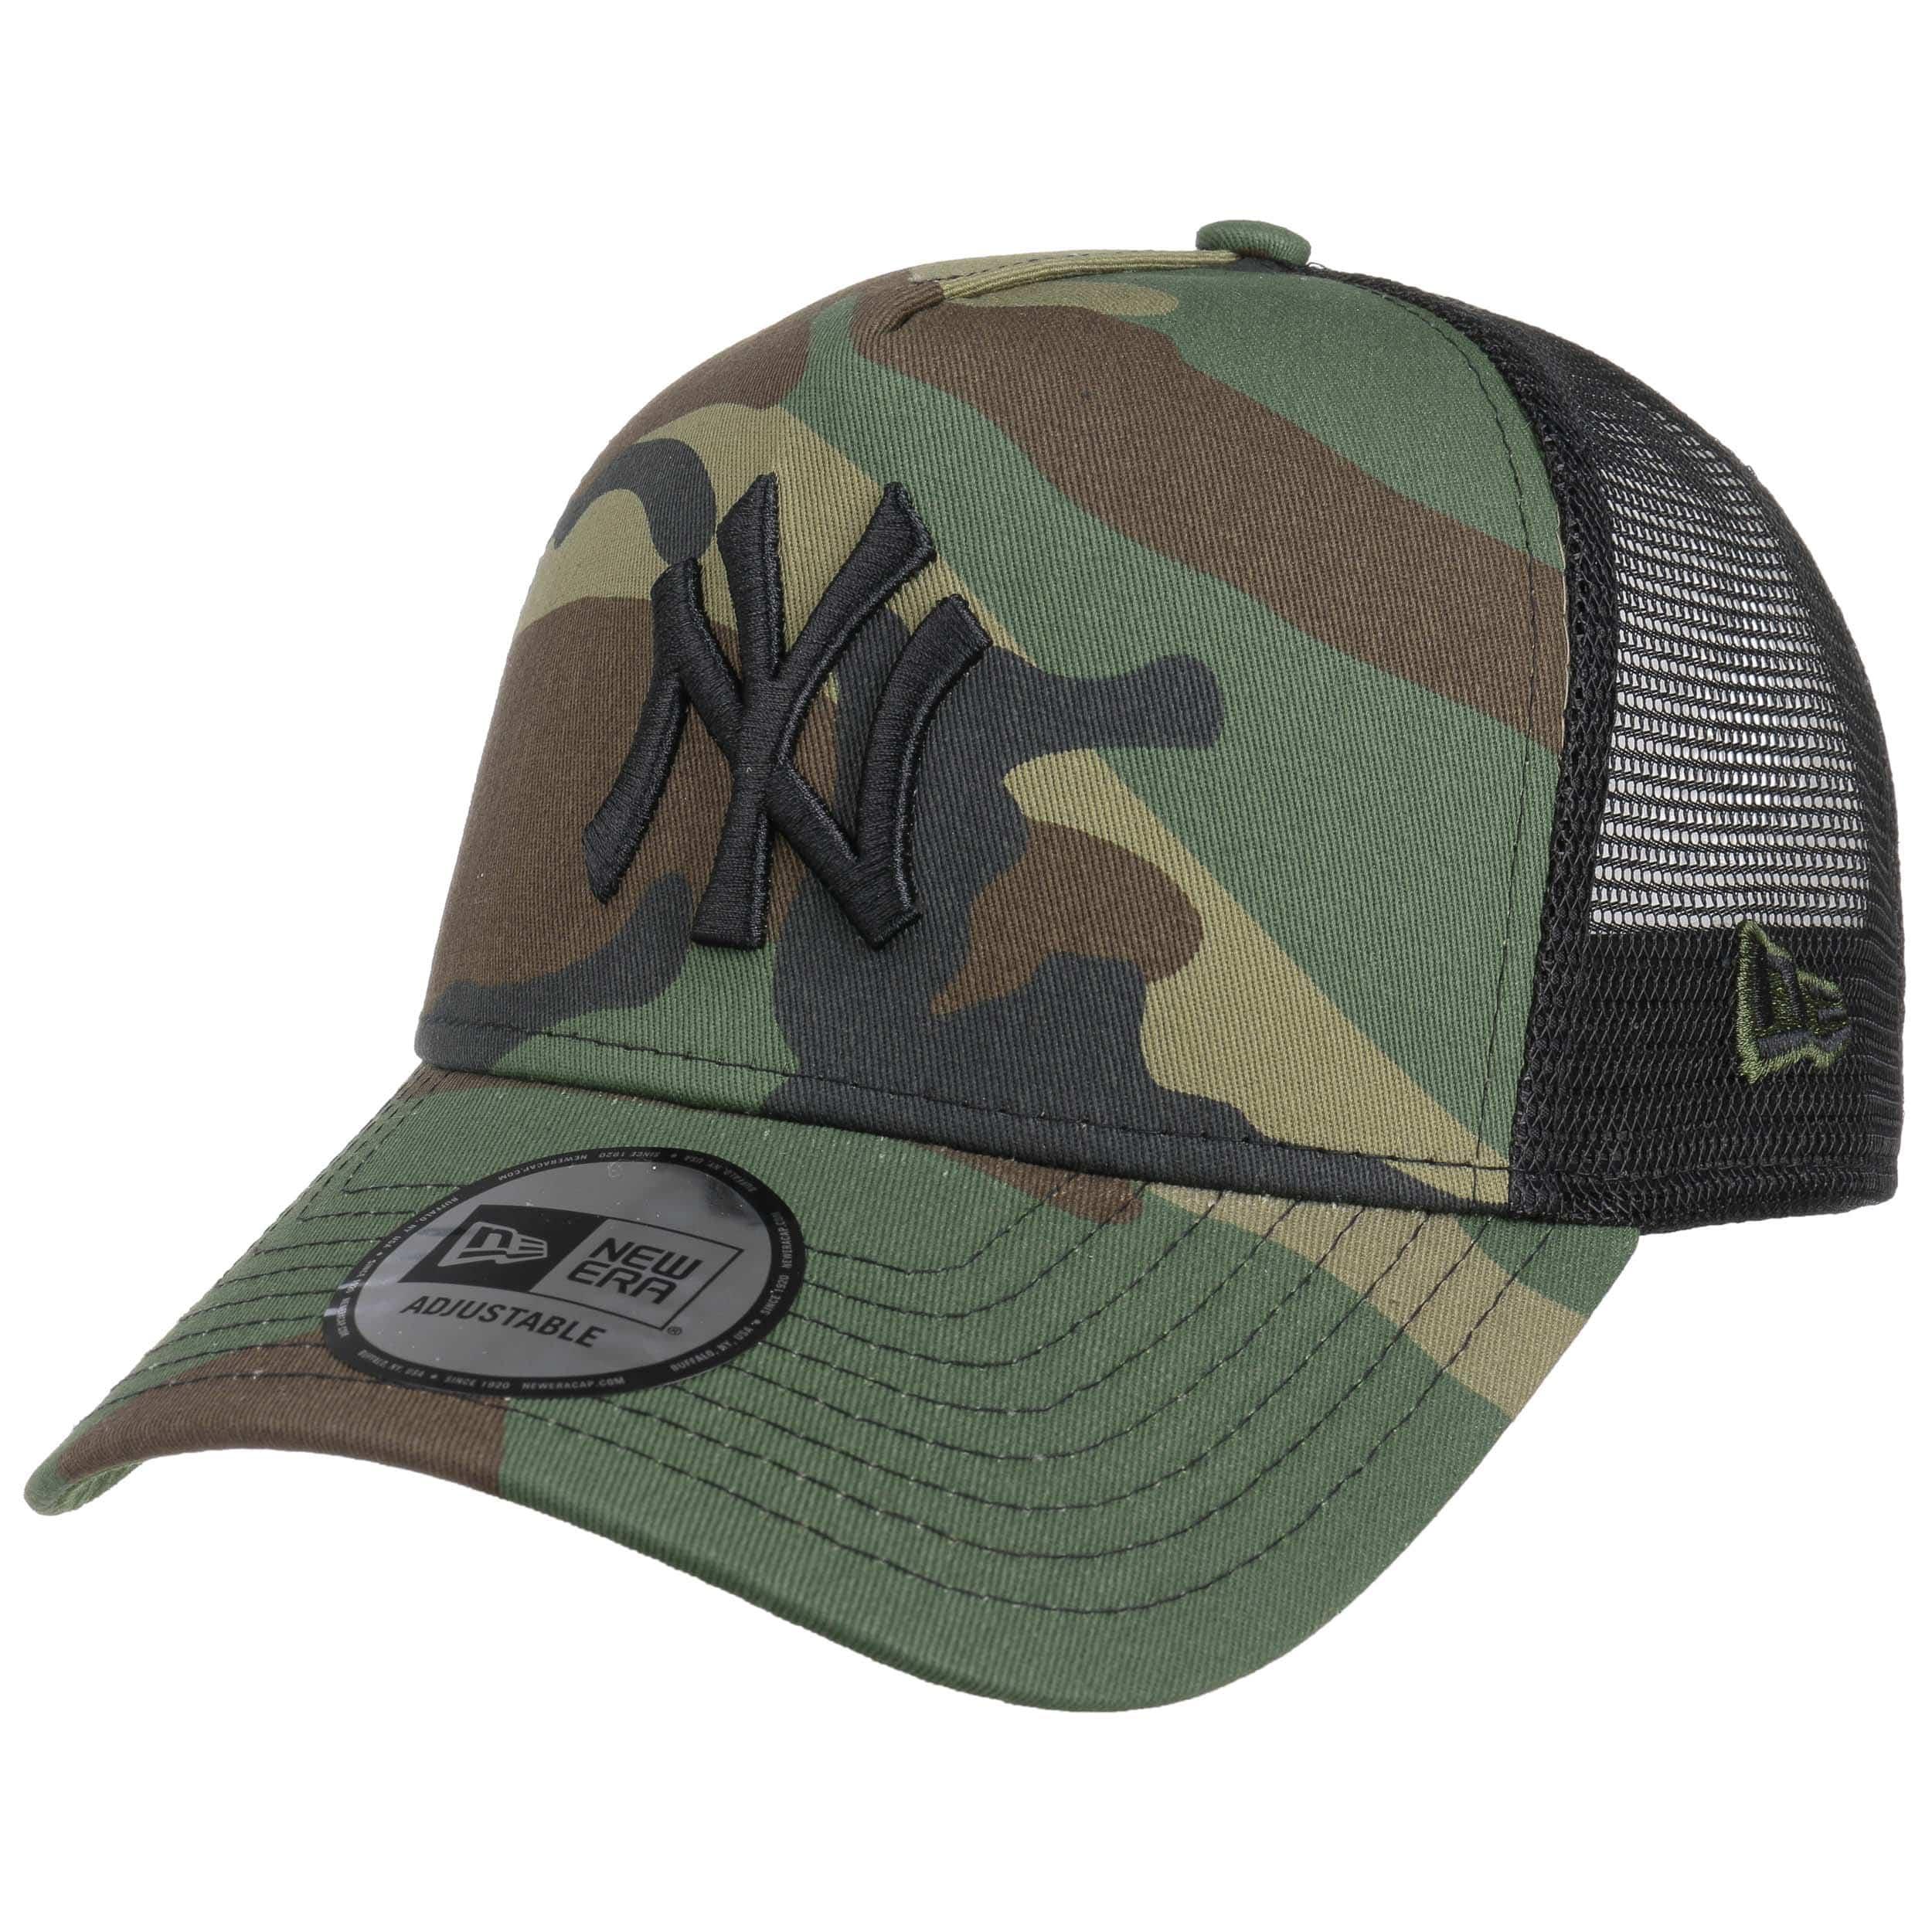 Gorra Camo Team Yankees Trucker by New Era - Gorras - sombreroshop.es 34896298837